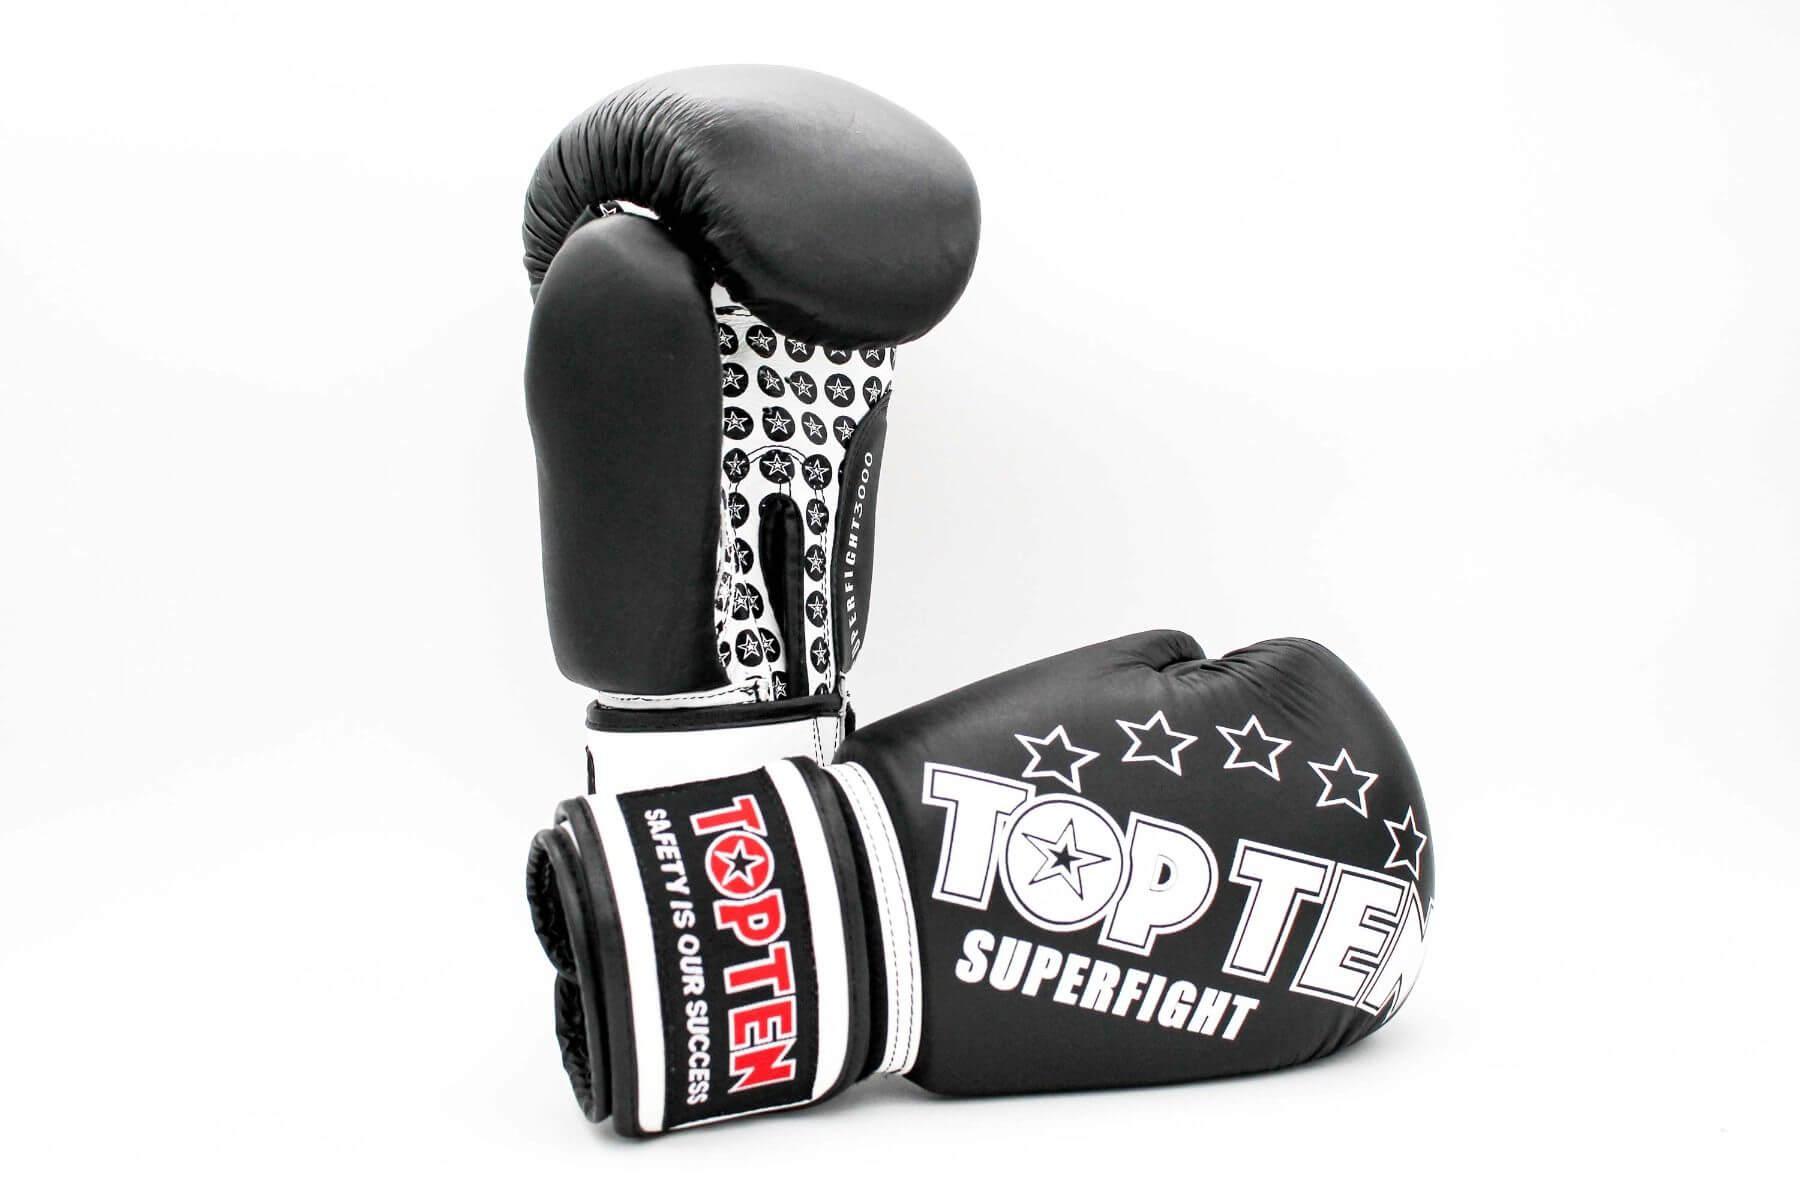 Boxhandschuhe Superfight 3000 Schwarz